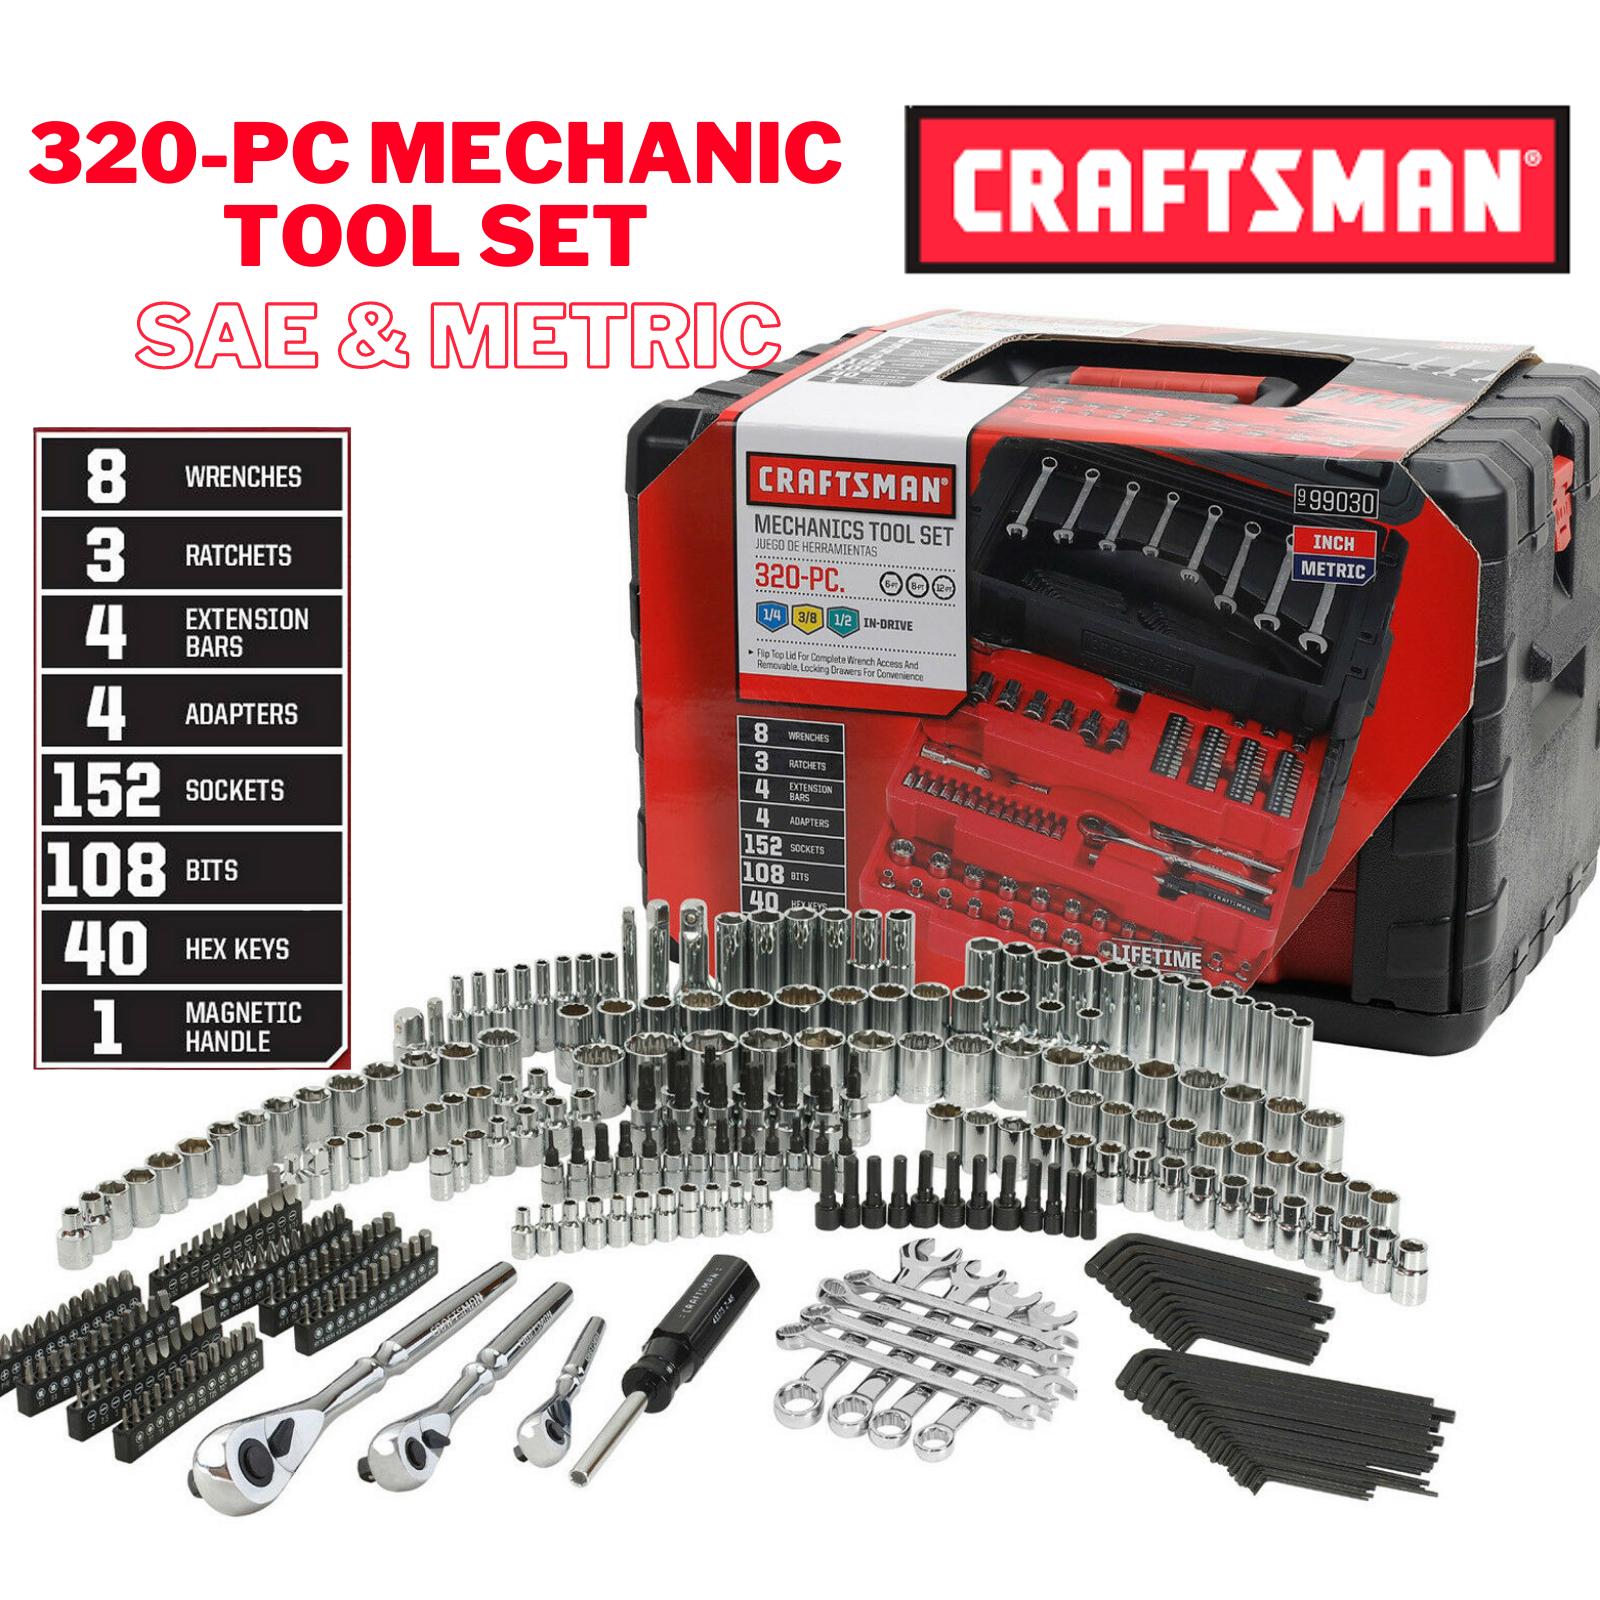 Craftsman 320 Piece Mechanic's Tool Set With 3 Drawer Case 9